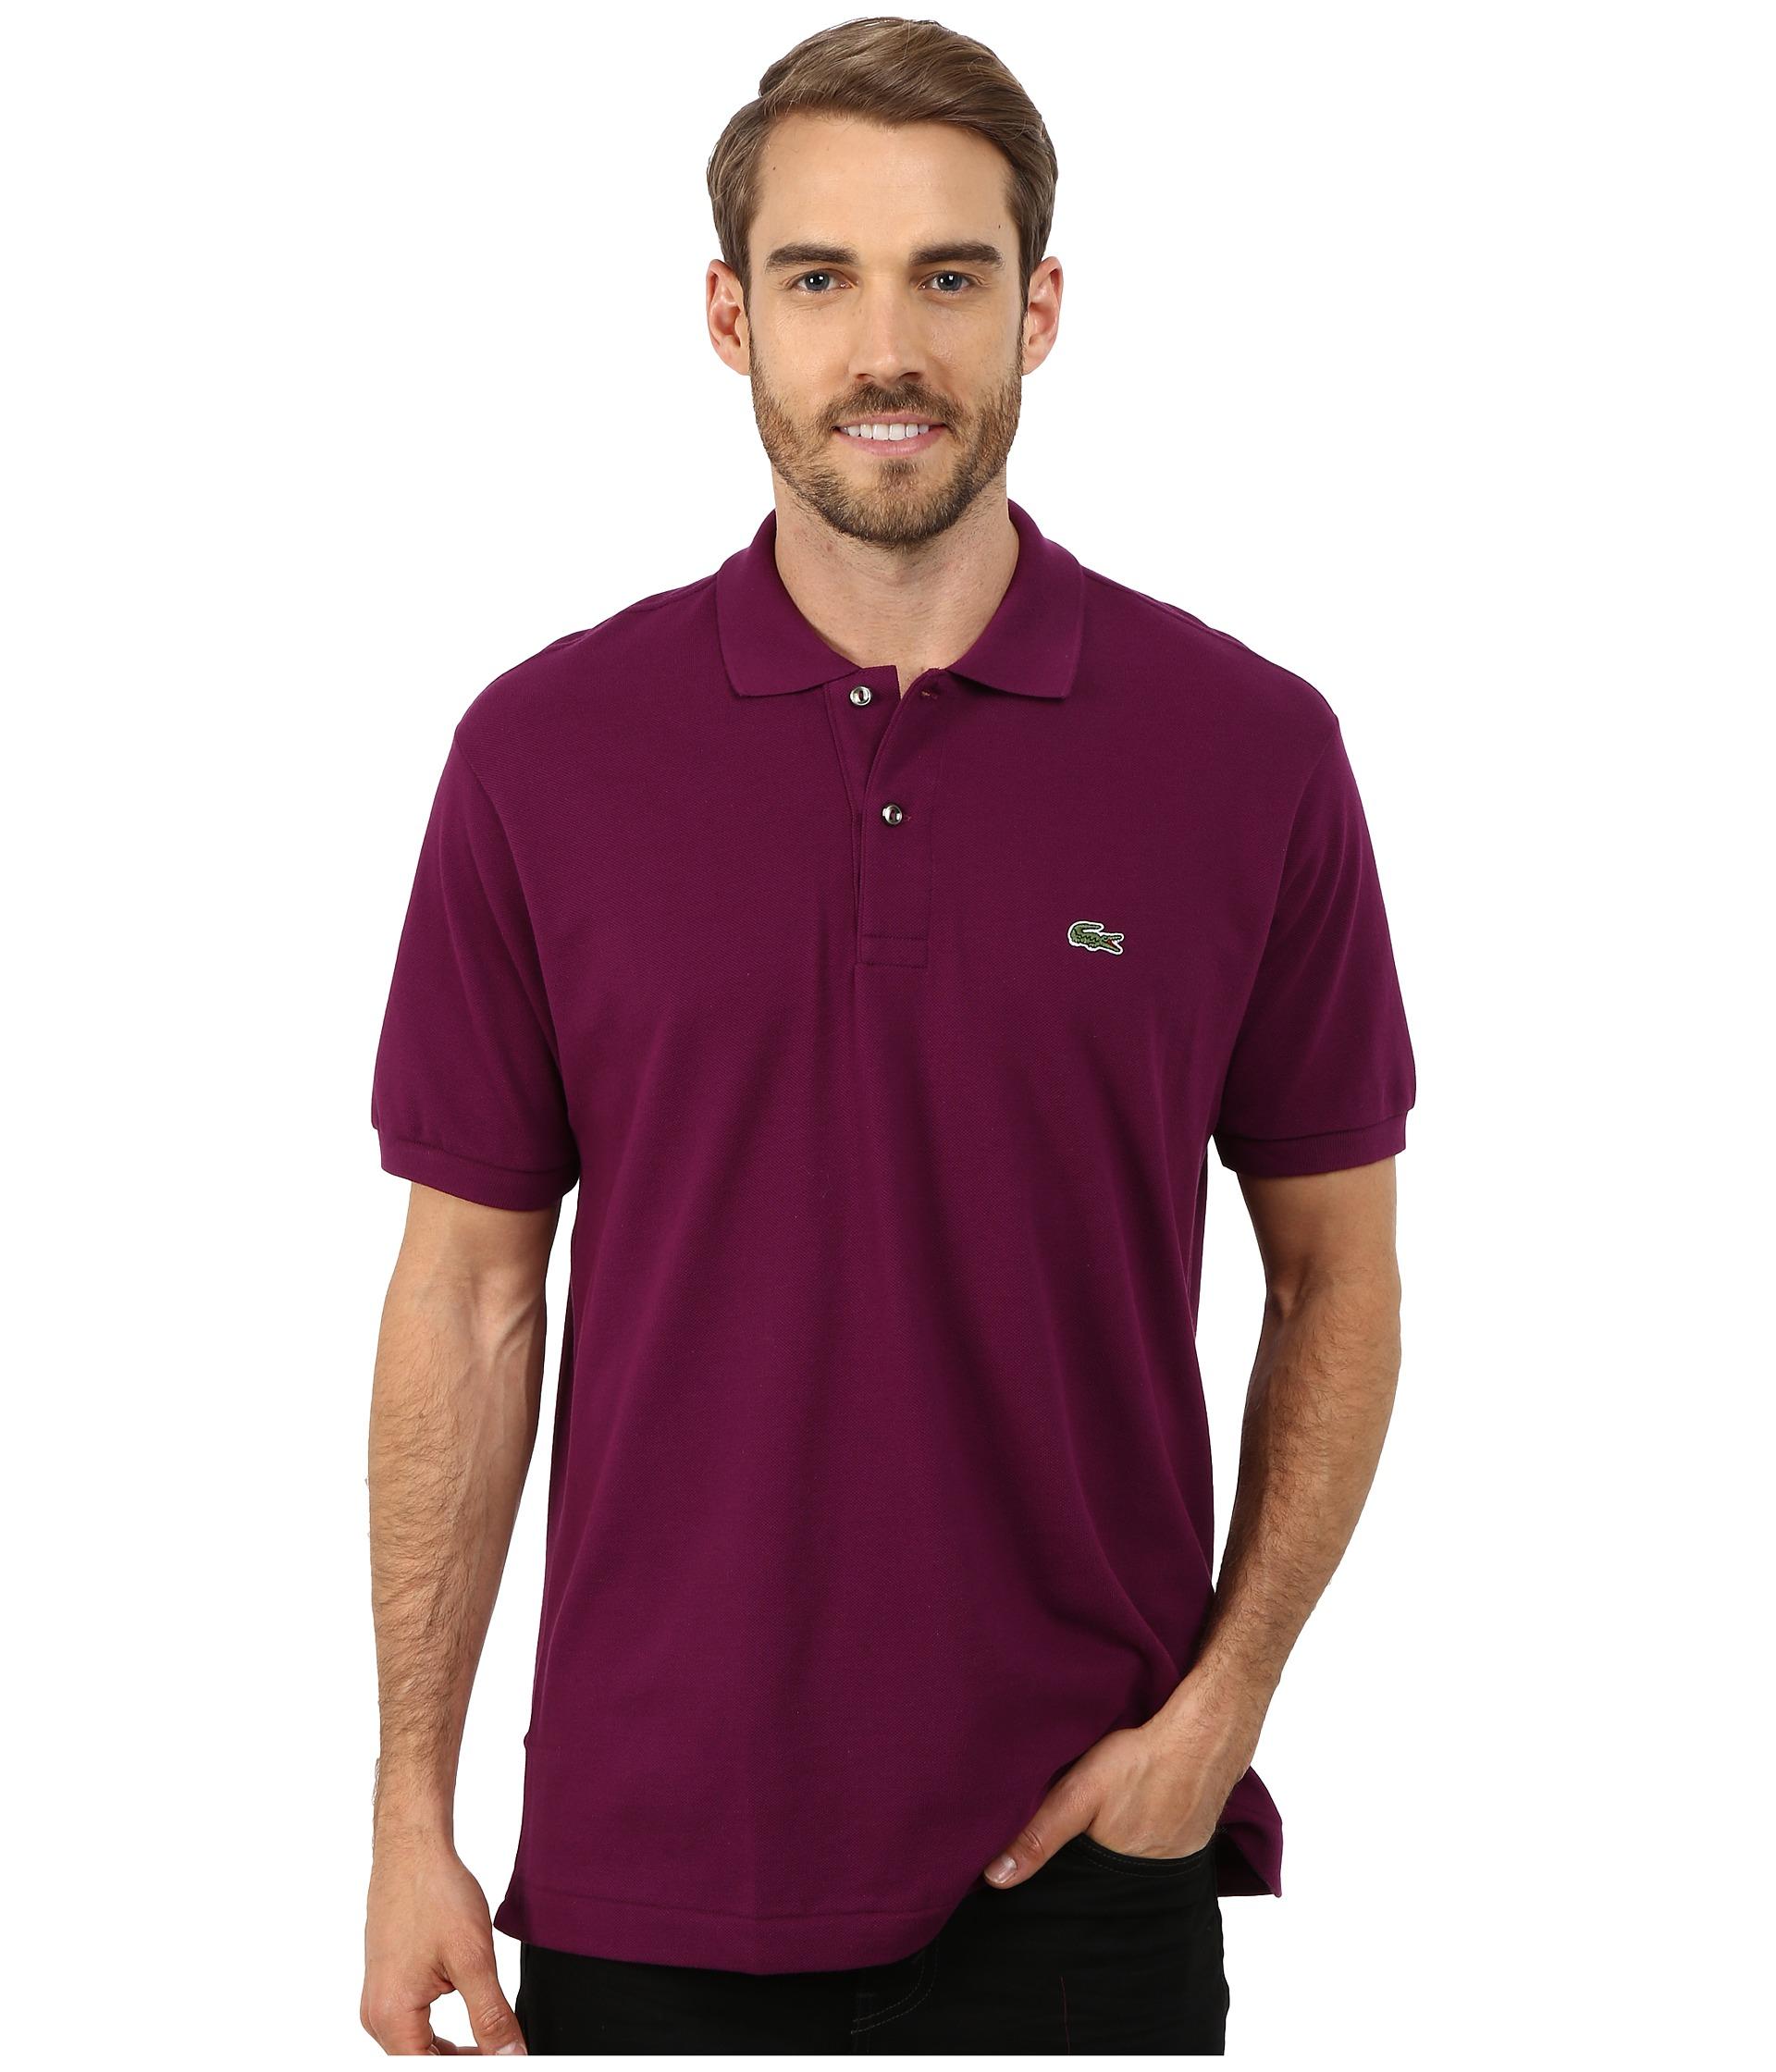 Lacoste l1212 classic pique polo shirt urchine purple for Lacoste size 4 polo shirt